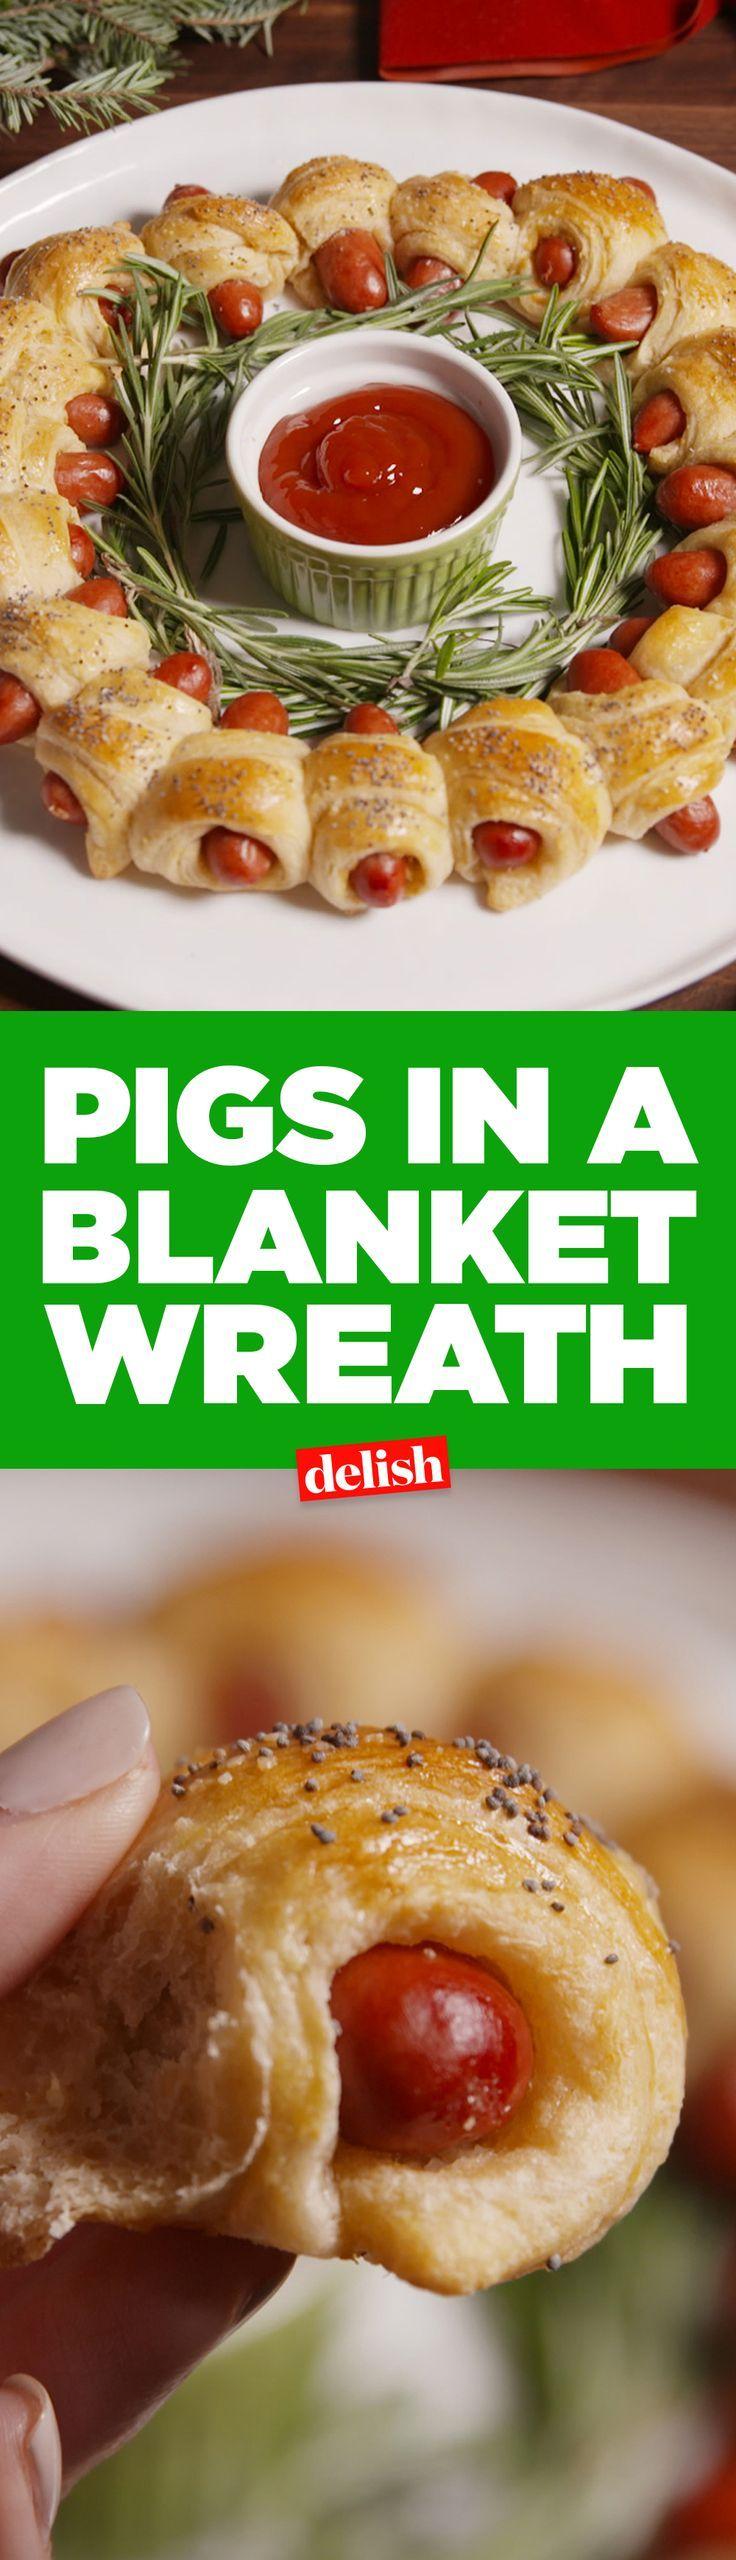 Pigs In A Blanket Wreath Recipe Best christmas